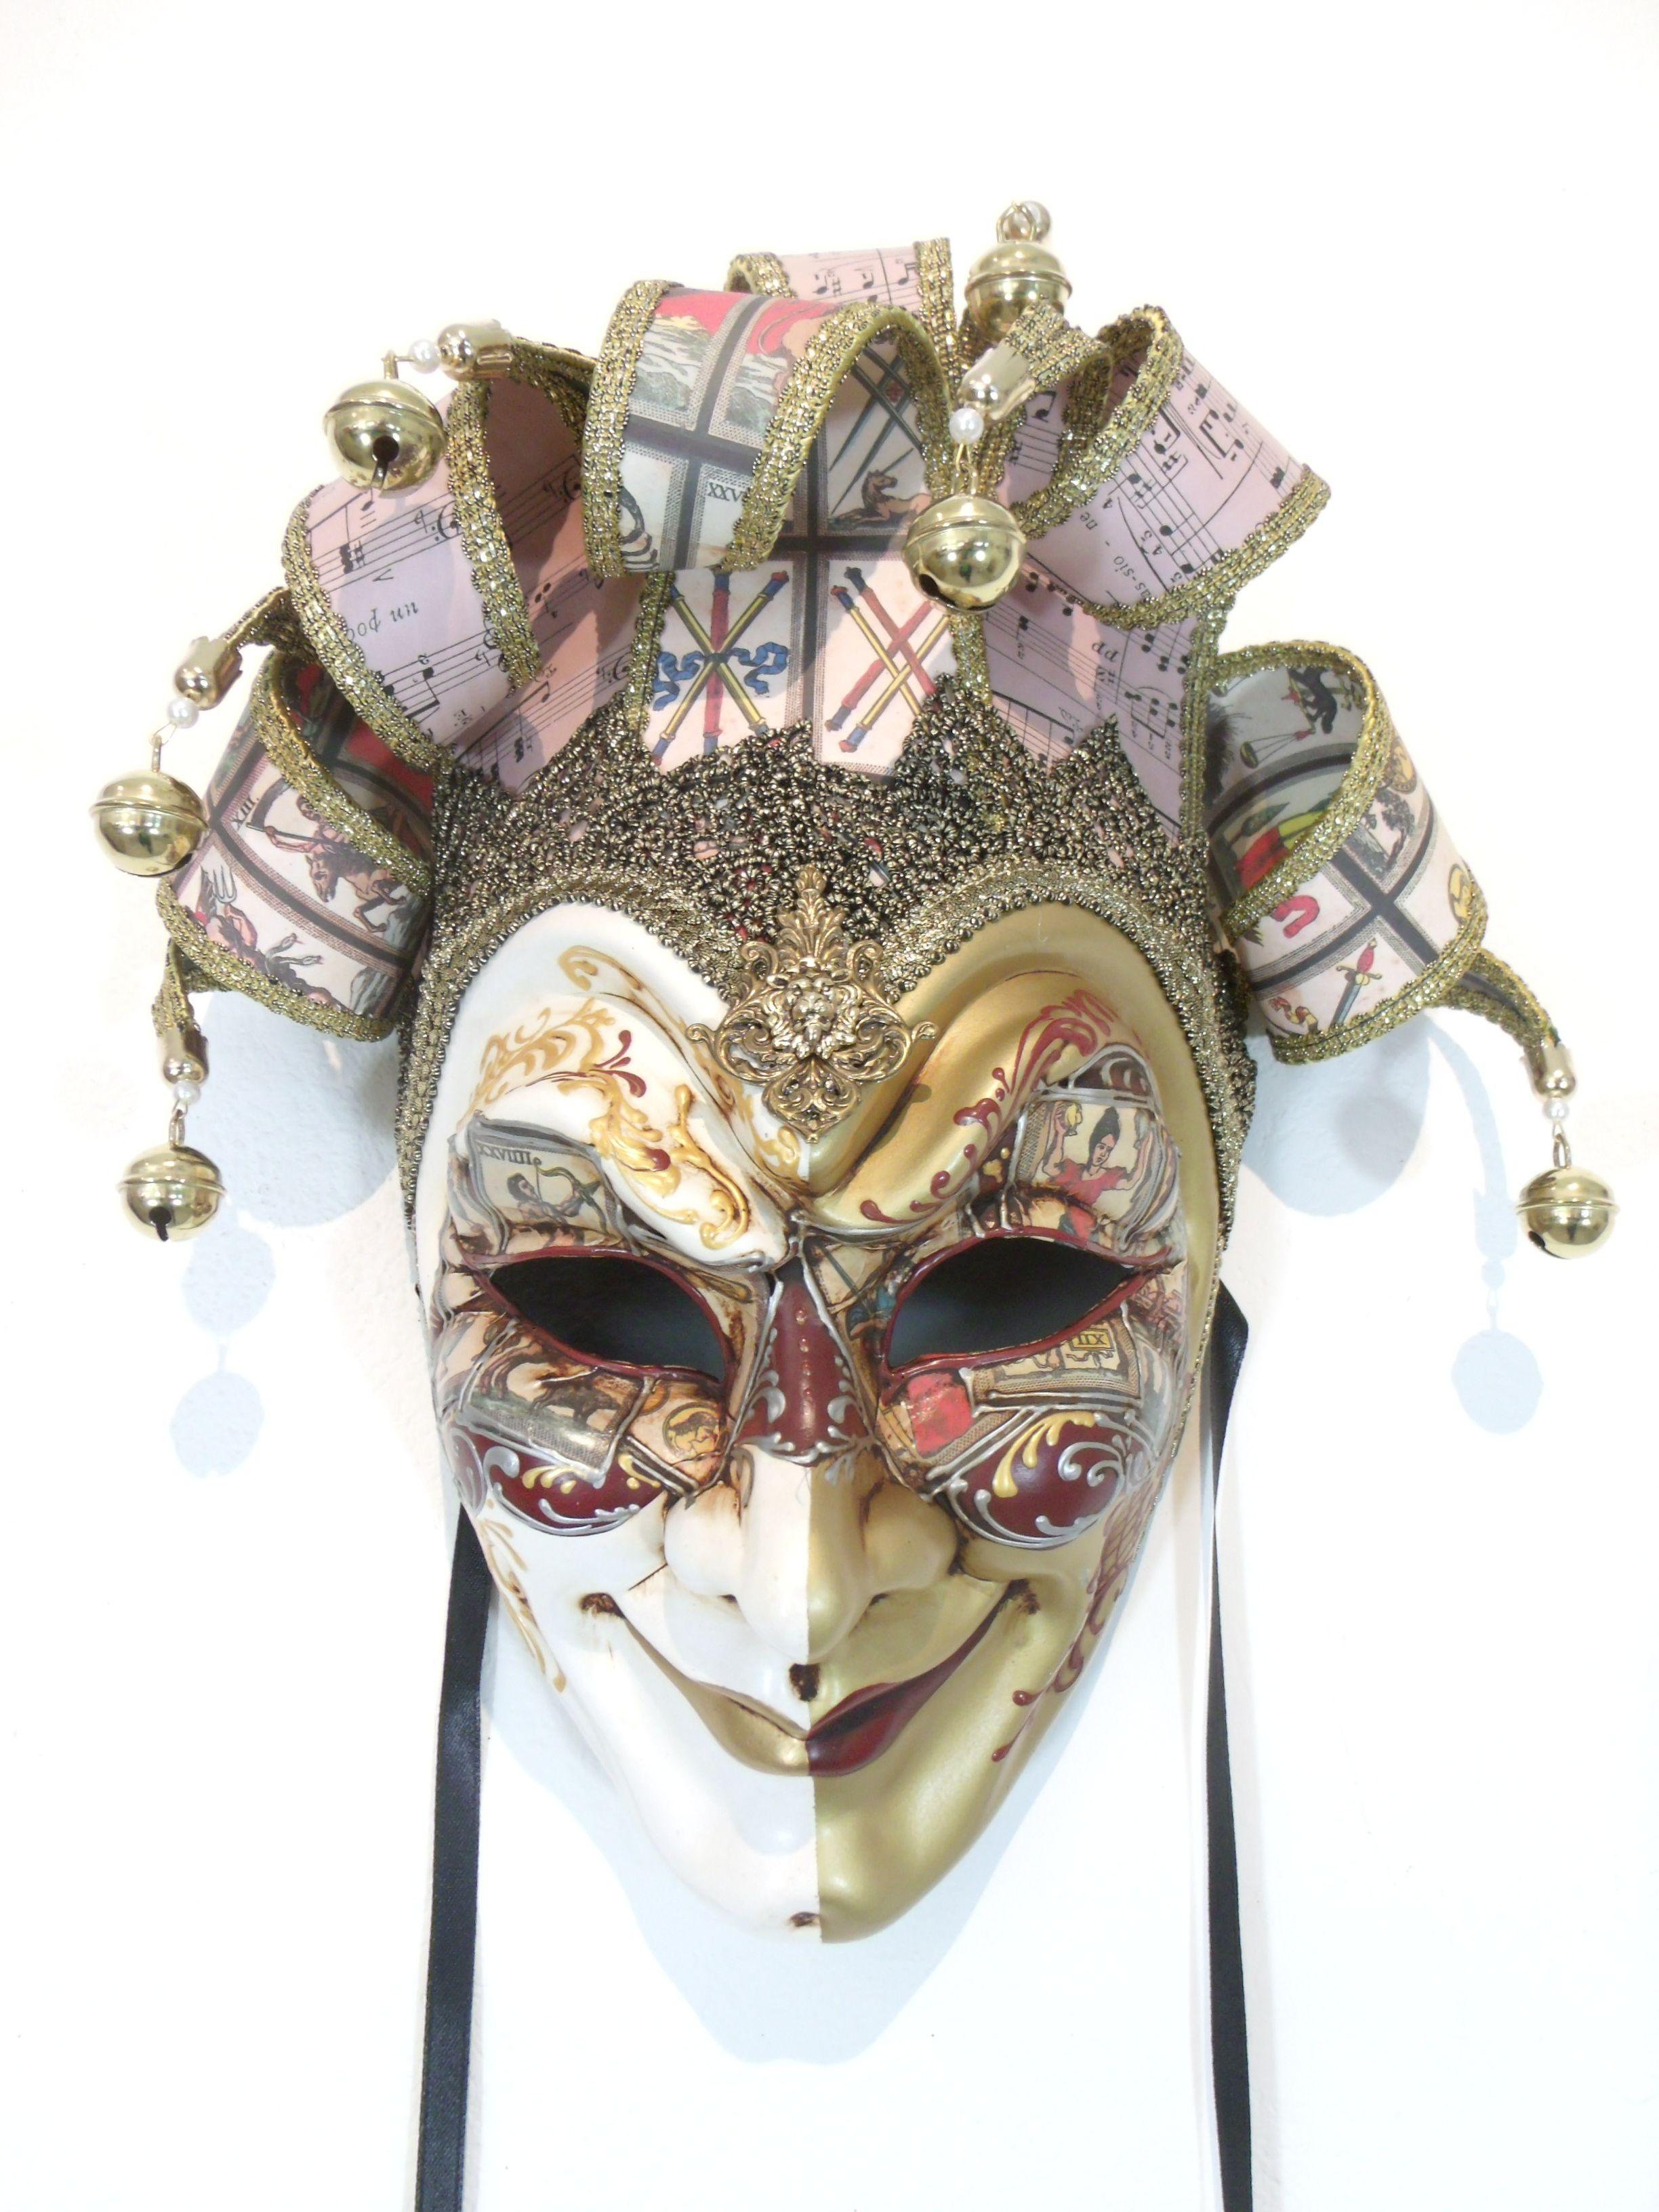 Tarot Card Joker Mask Www.venicebuysmasks.com